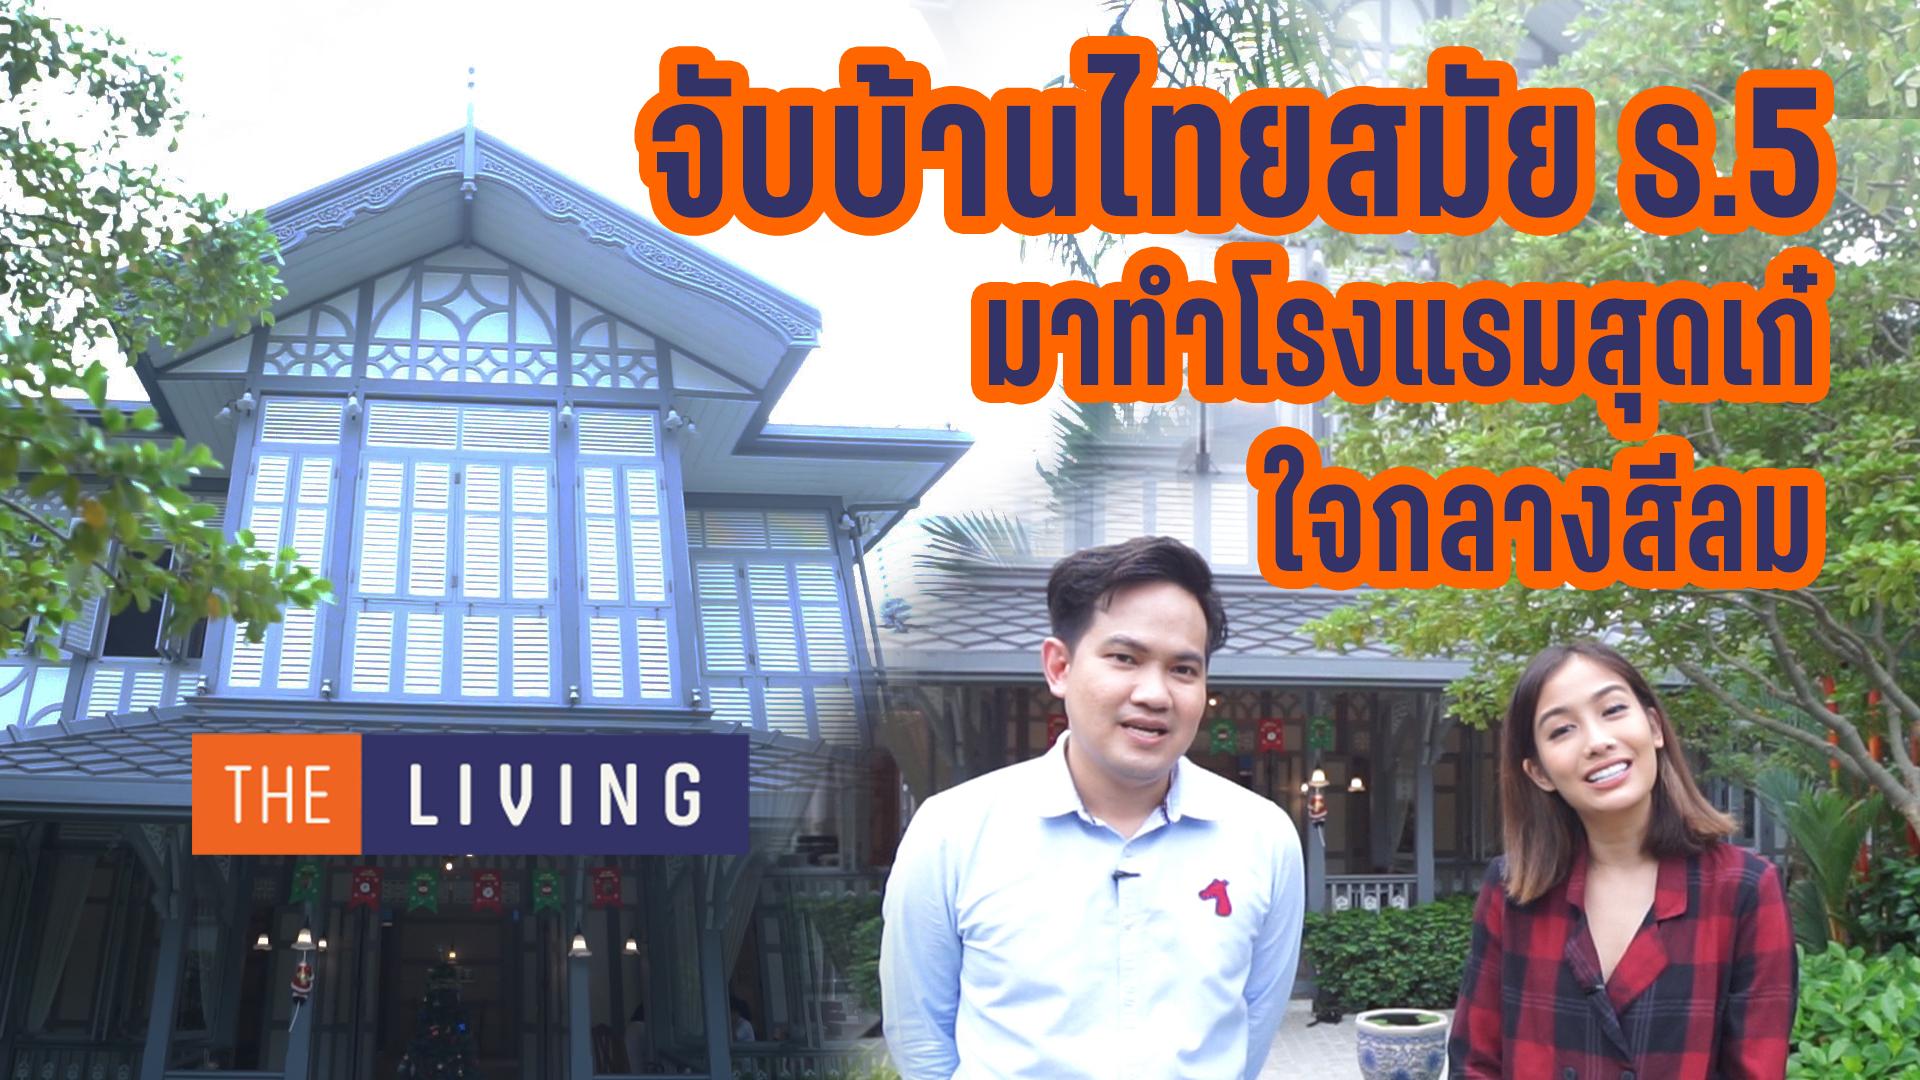 THE LIVING EP.2 พาย้อนยุค ดูบ้านเก่าสมัย ร.5 ที่มาทำเป็นโรงแรมสุดเก๋ ใจกลางสีลม !!!